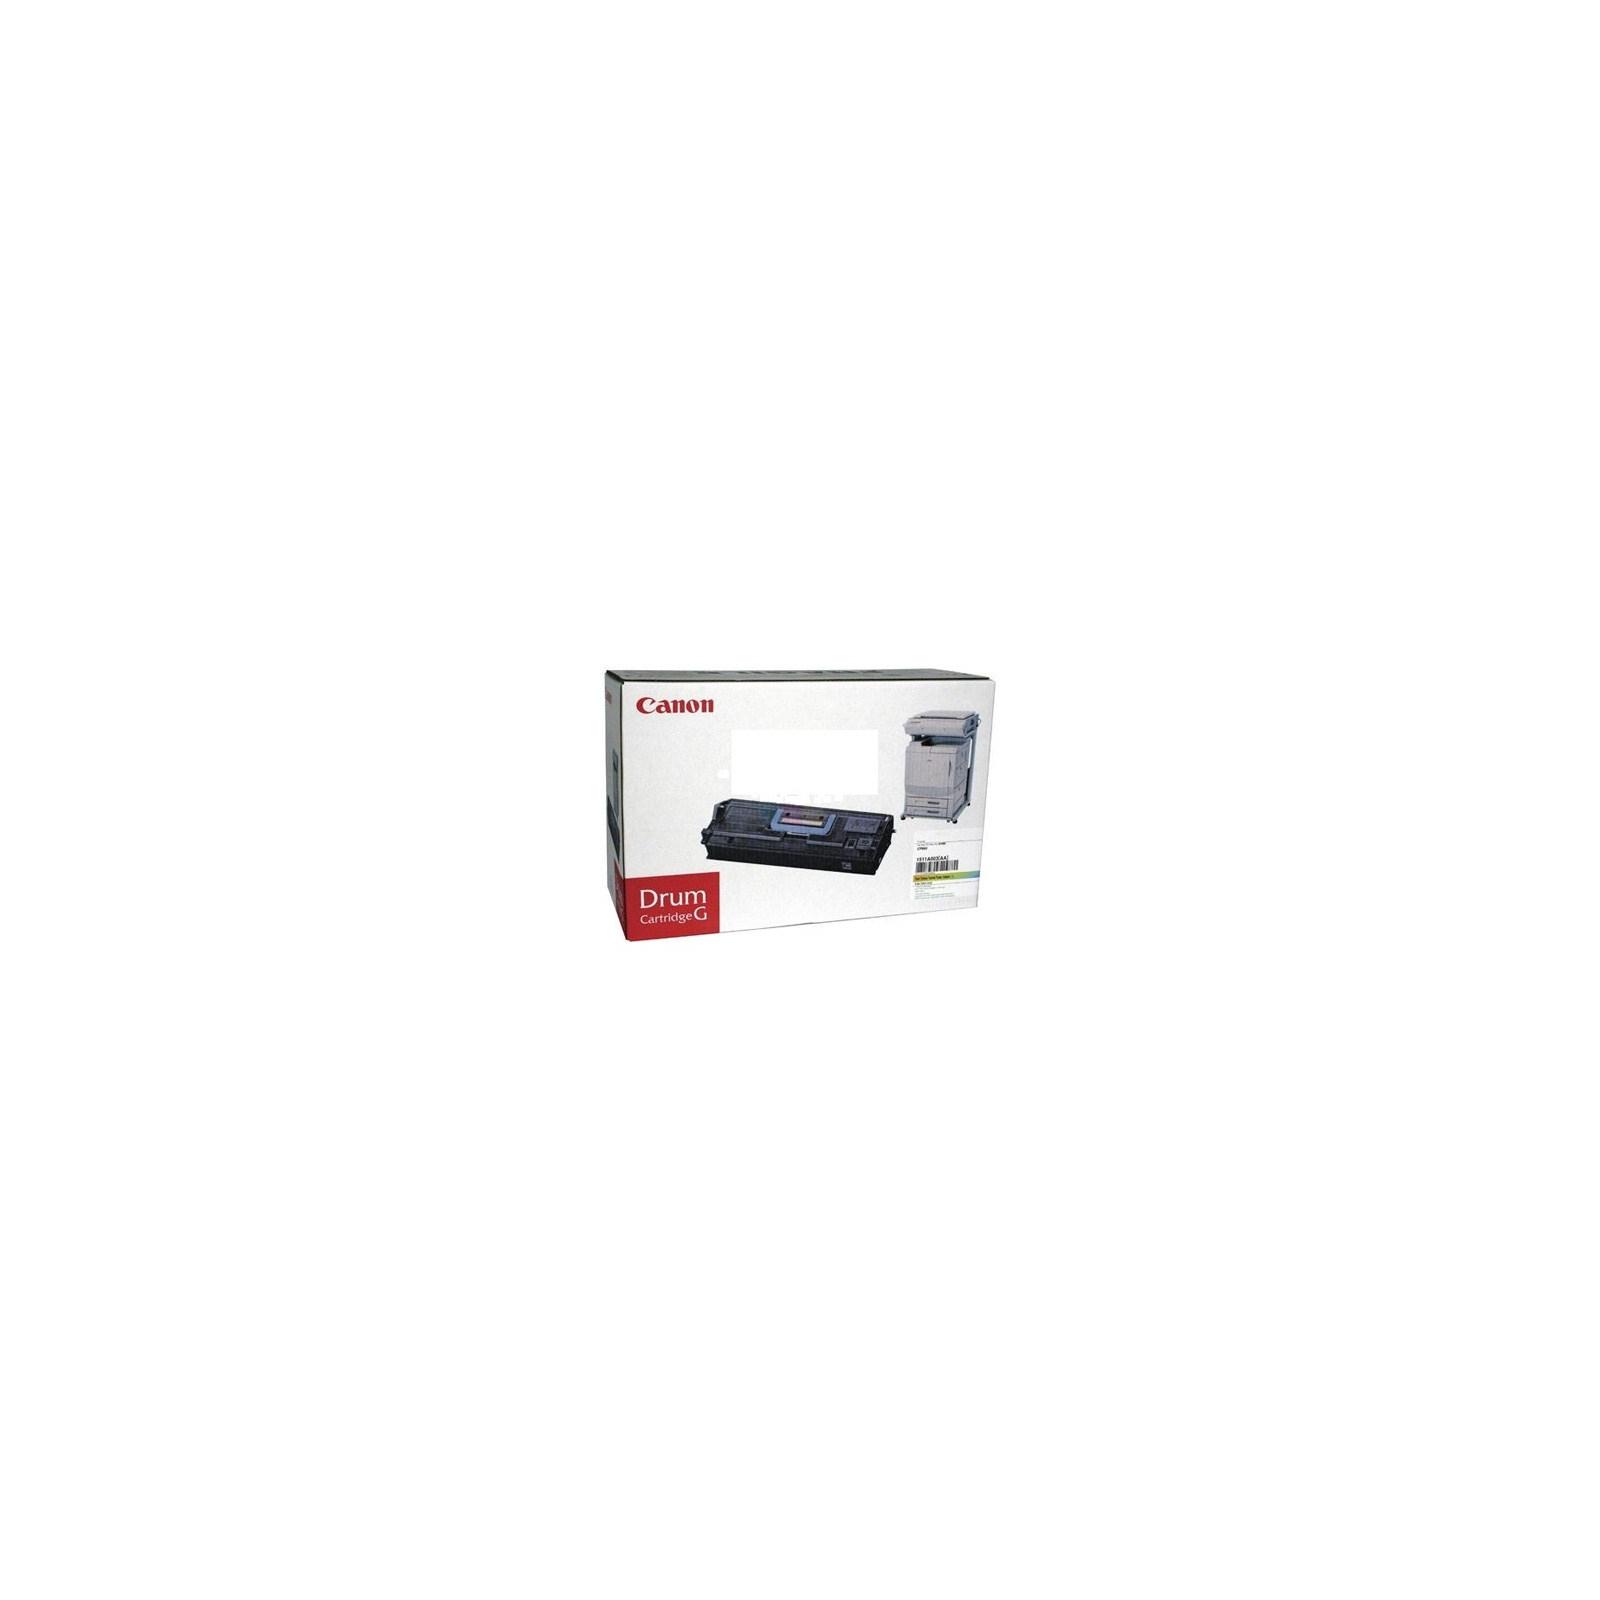 Драм картридж Canon CP660 для iRC624 (12.5К) (1511A003)